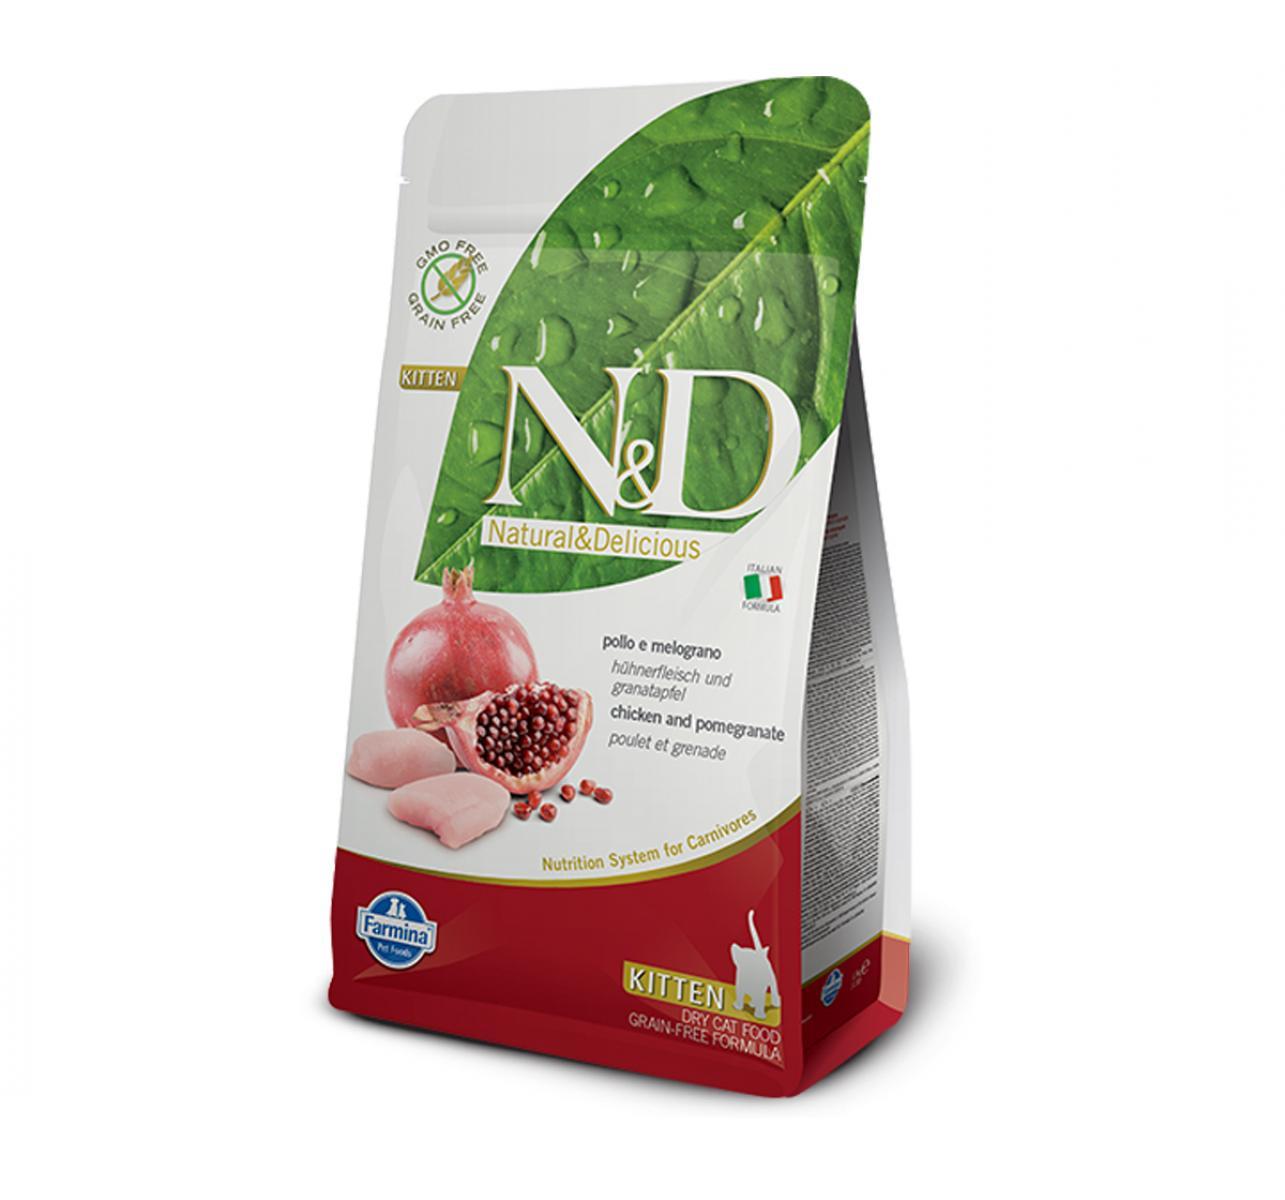 Natural & Delicious Grain Free Chicken & Pomegranate Kitten - 1.5 Kg